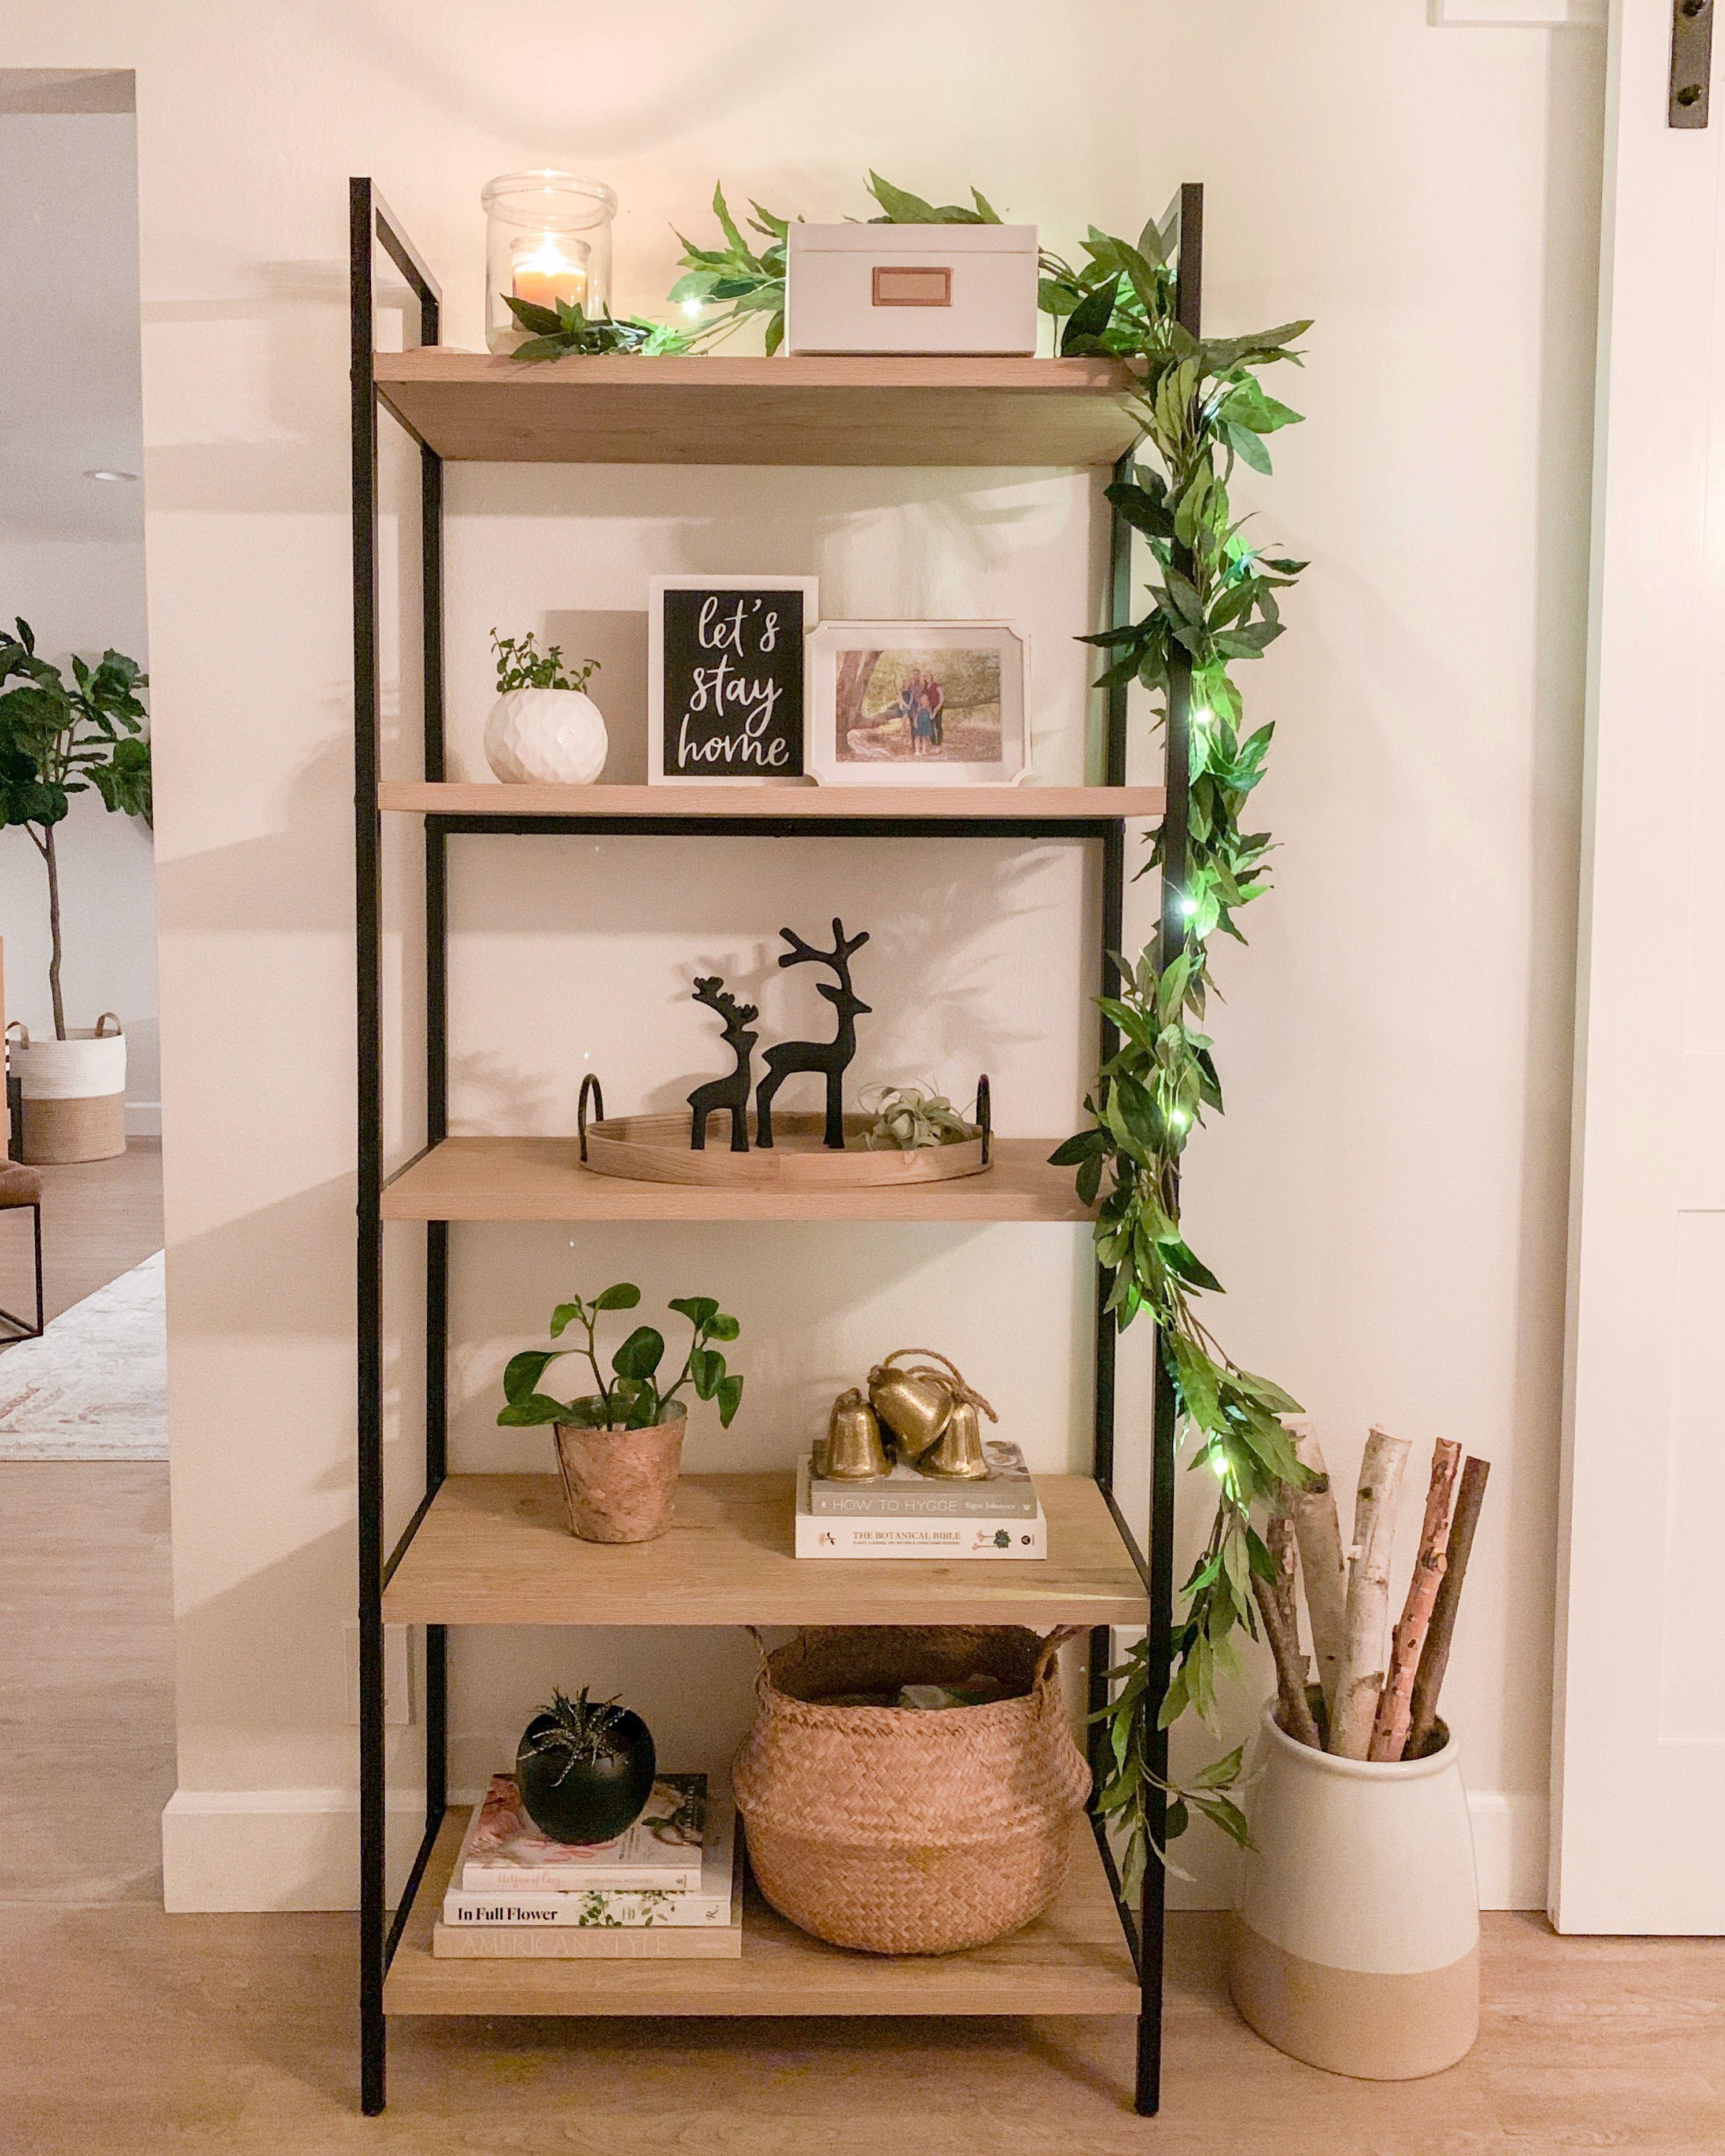 Modern Farmhouse Bookshelf Decorated for Christmas + Holidays